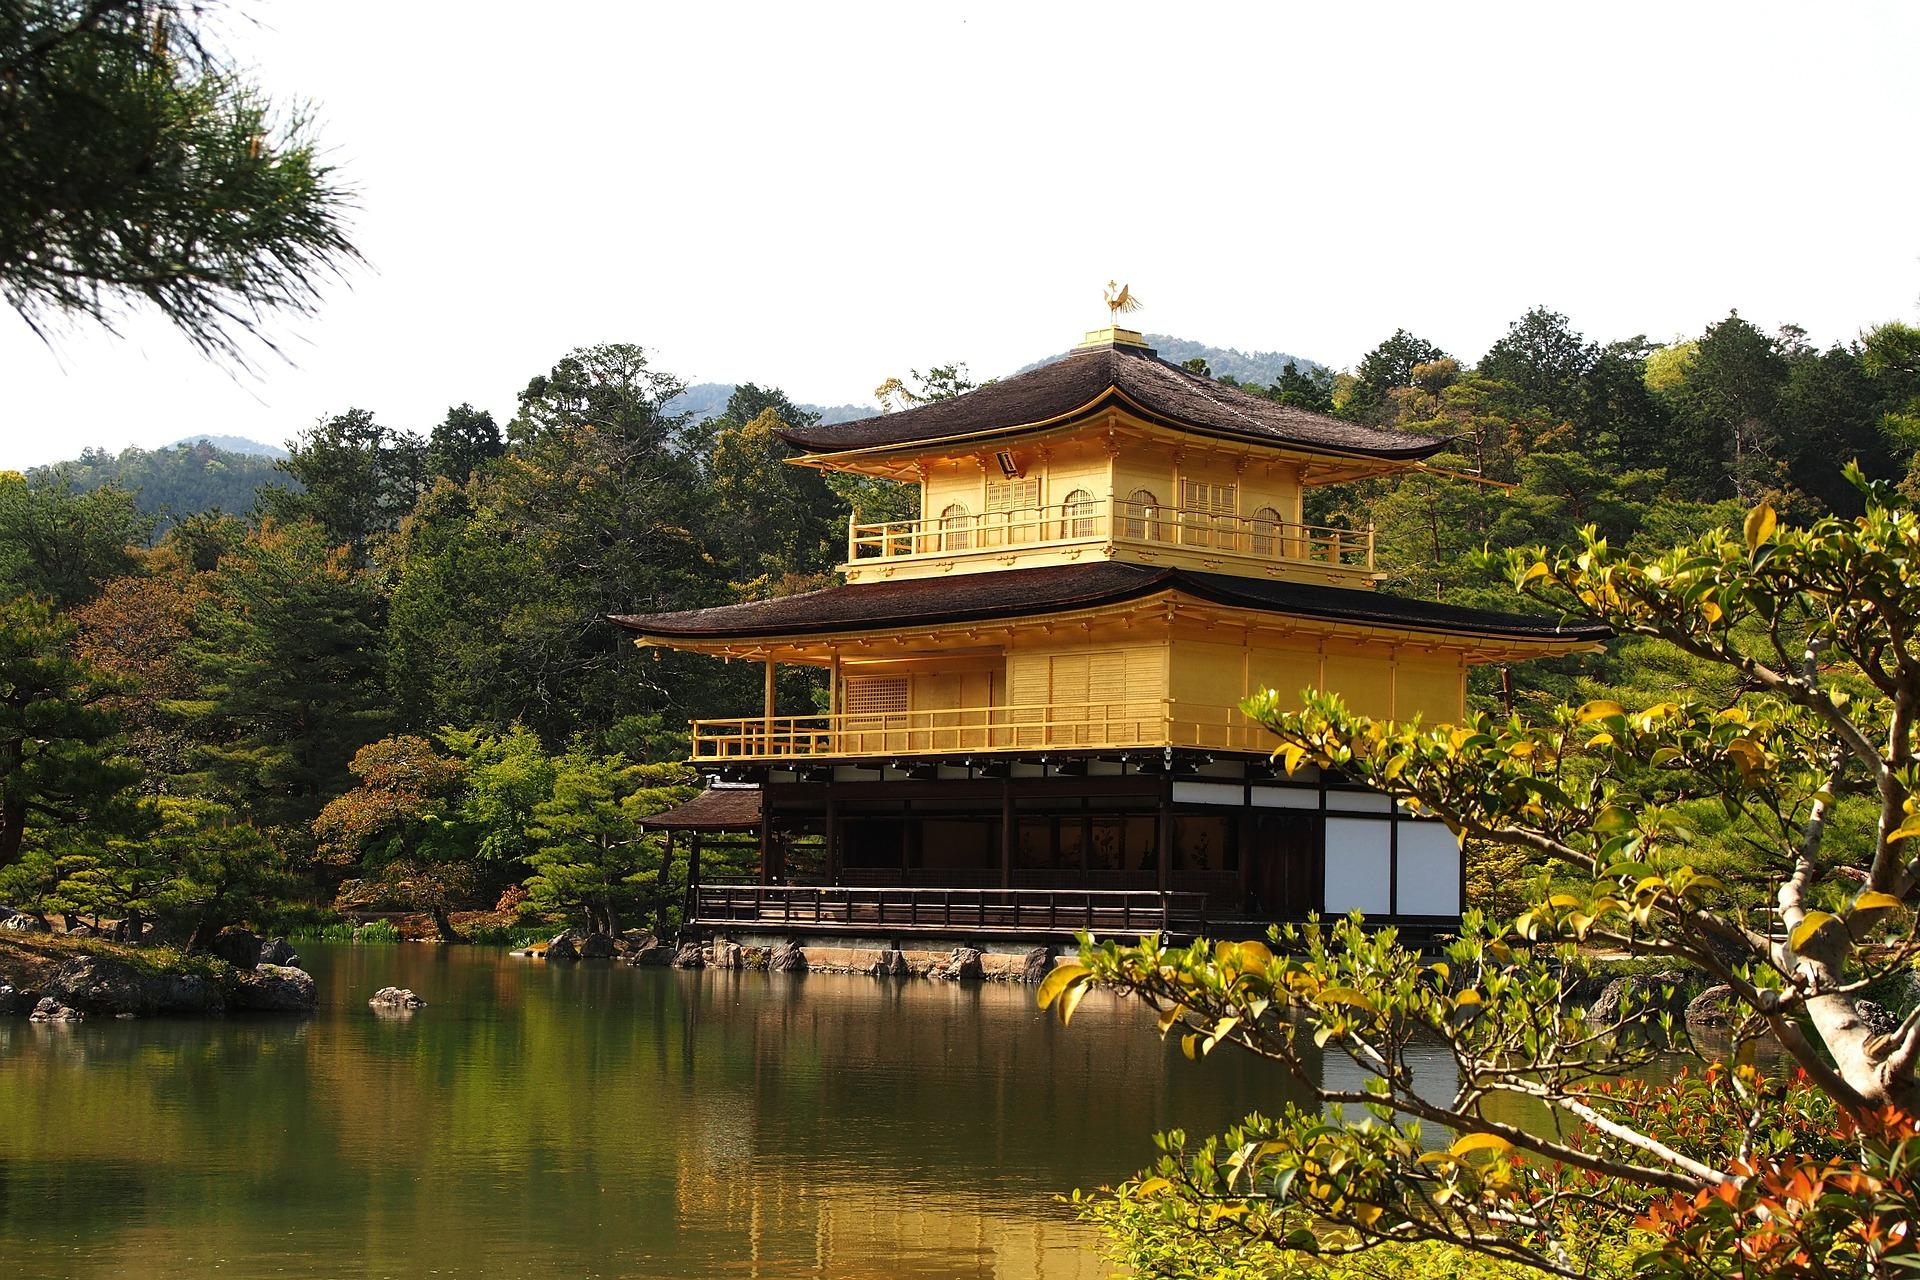 gold-temple-420675_1920.jpg